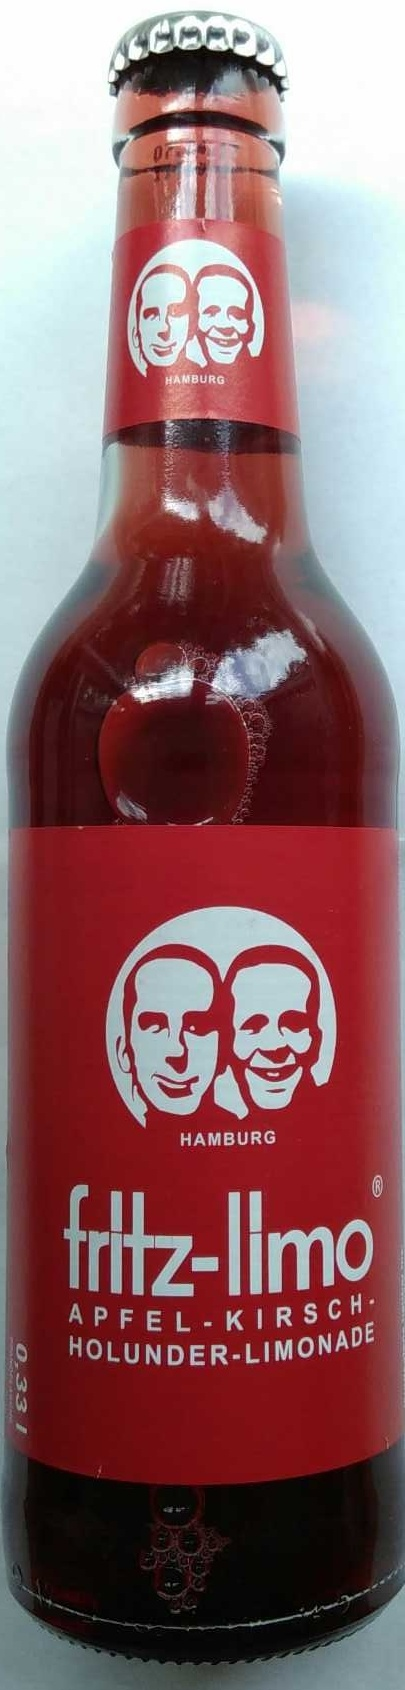 fritz-limo Apfel-Kirsch-Holunder-Limonade - Product - de